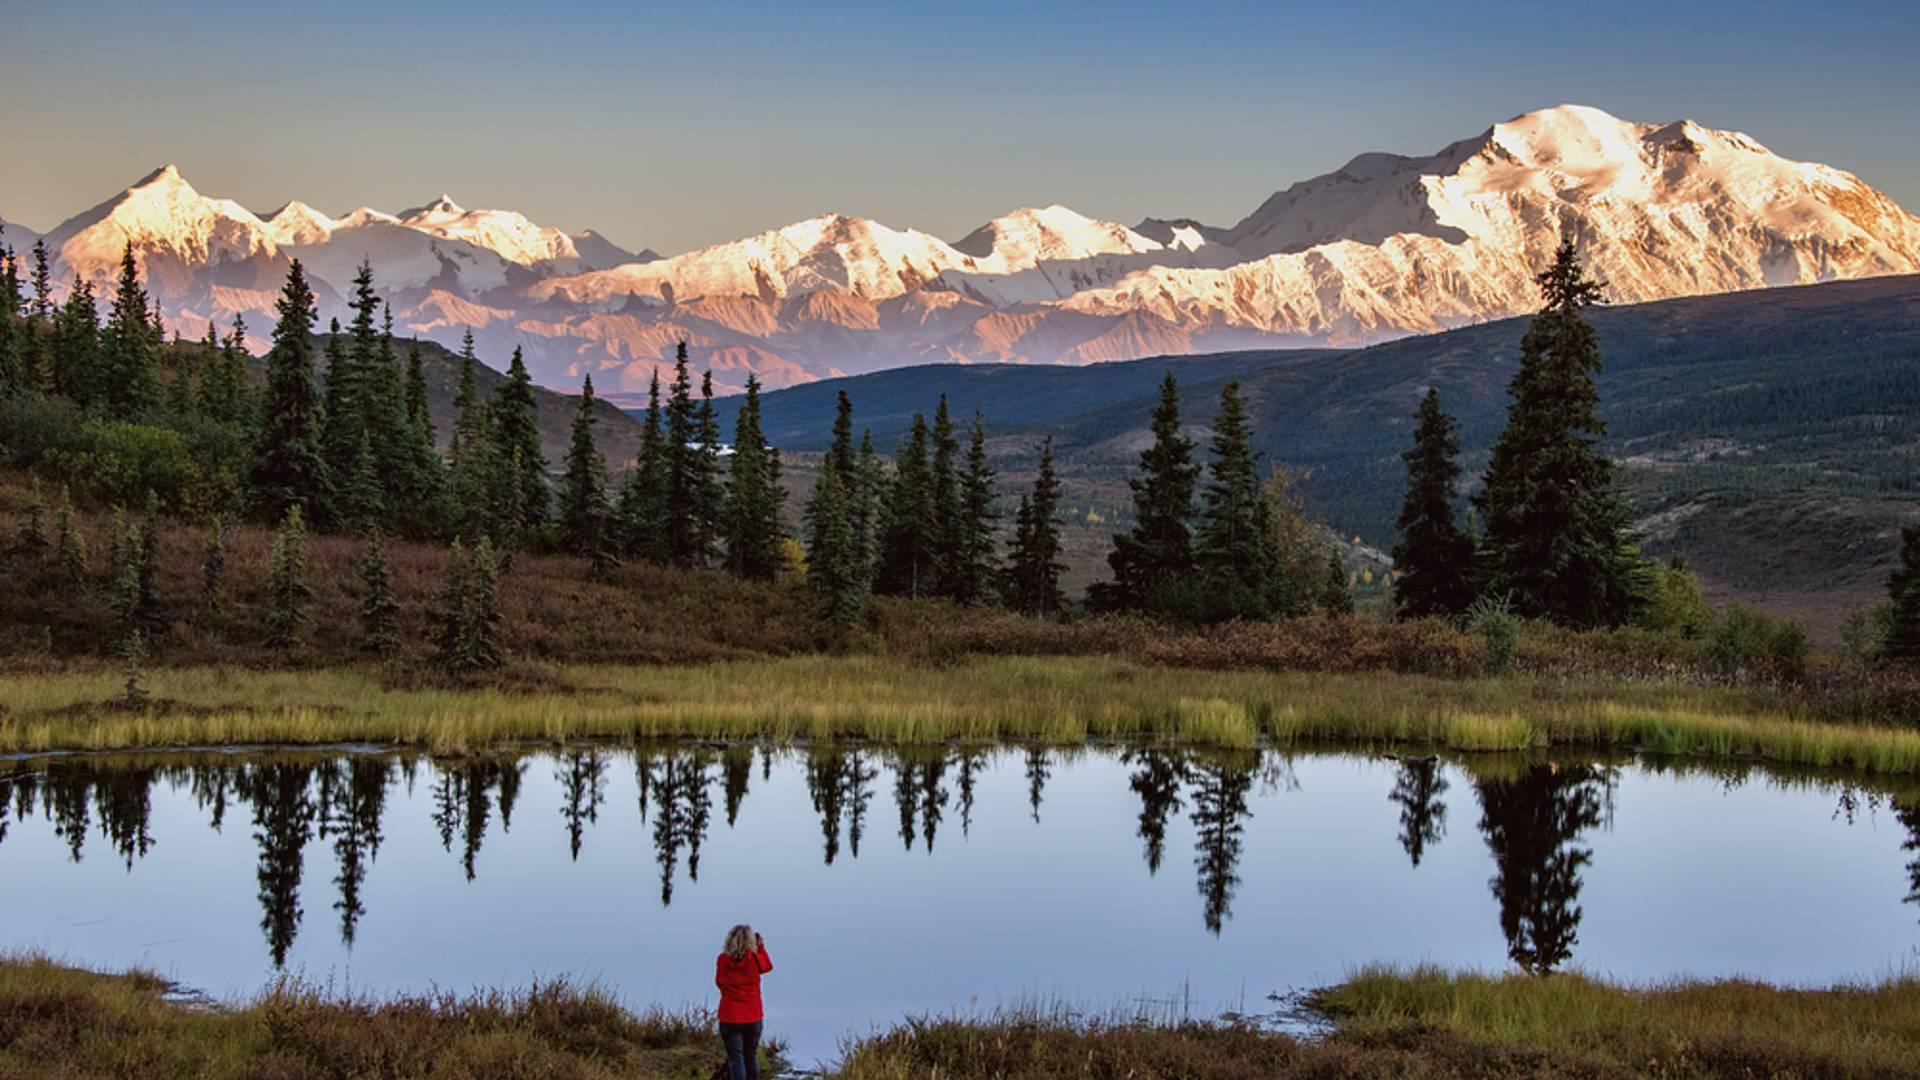 Abenteuertrip in der Wildnis Nordamerikas